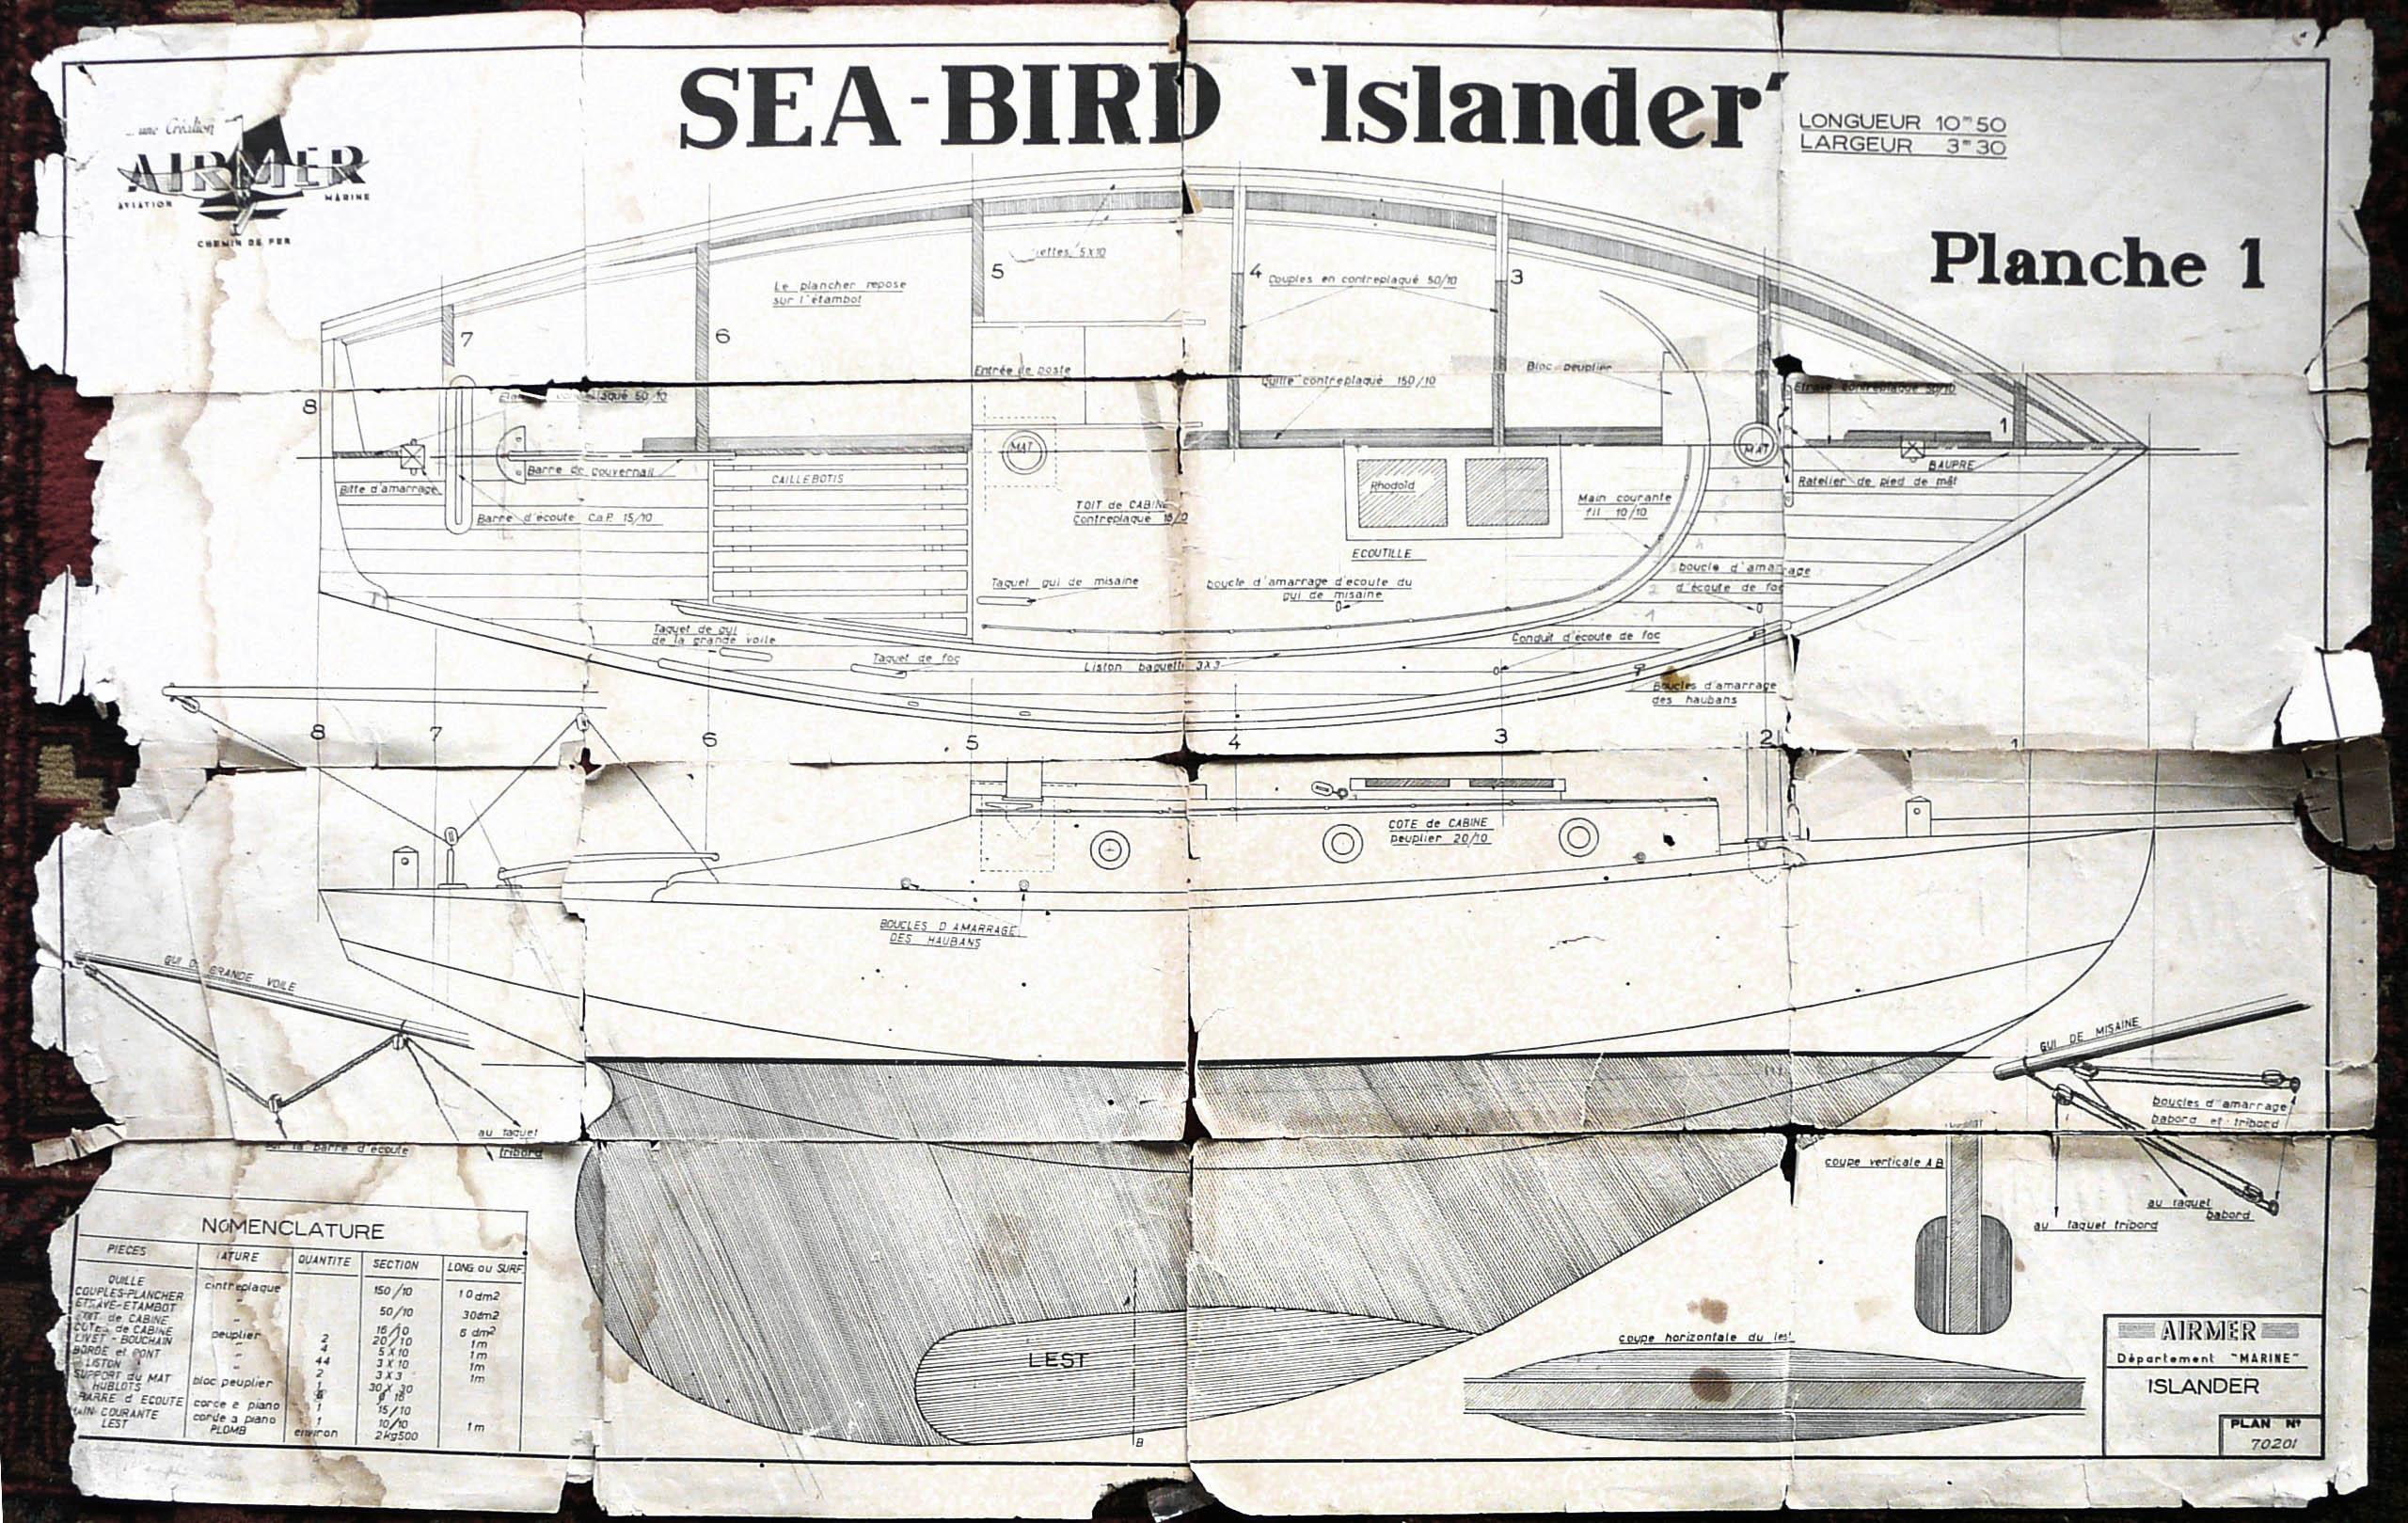 Modelisme Naval Le Sea Bird Islander D Airmer Un Plan Vintage De Voilier